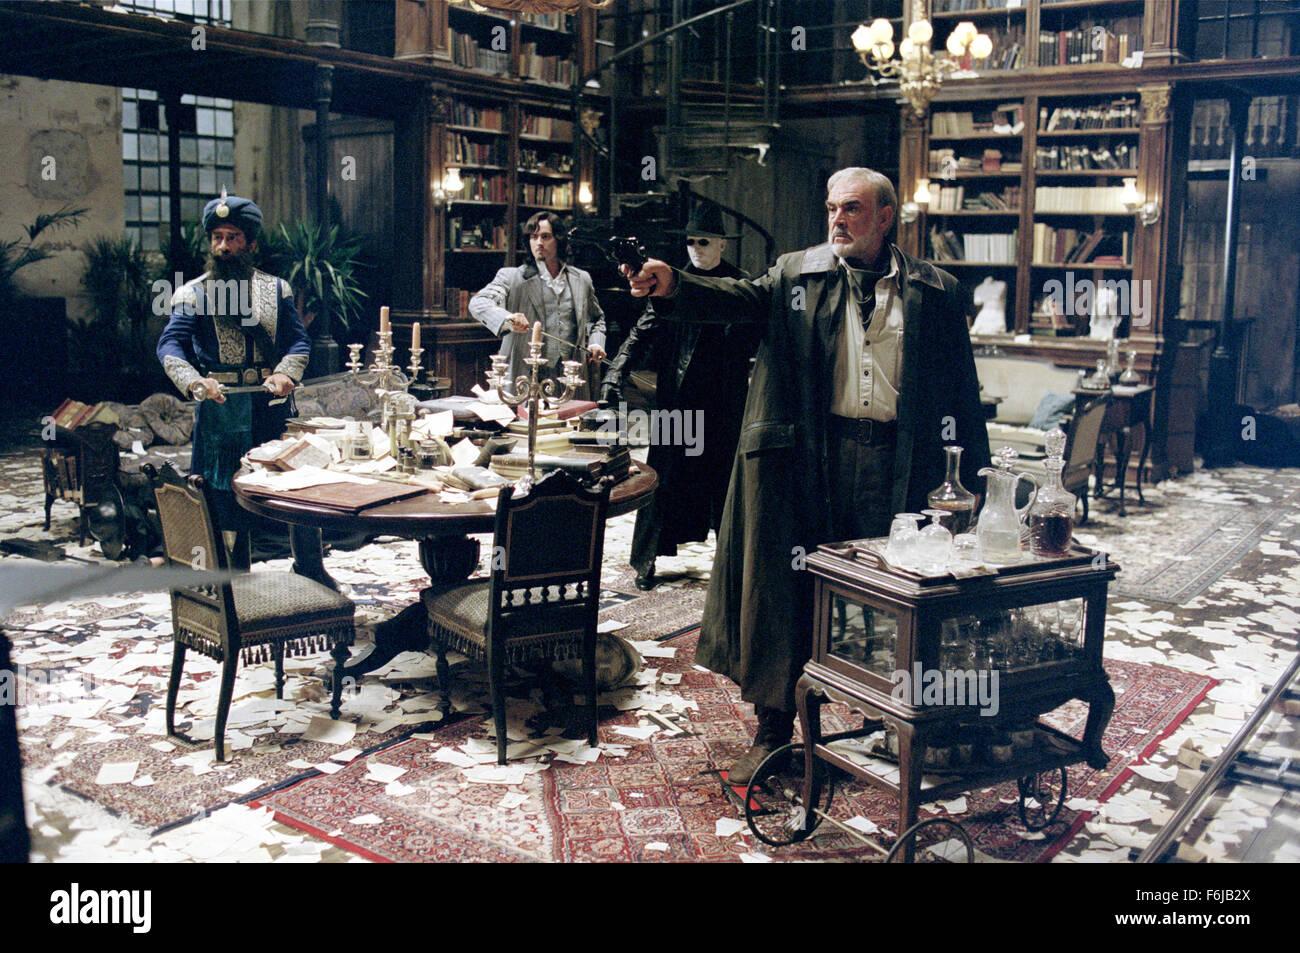 Jul 11, 2003; Hollywood, CA, USA; (left to right) NASEERUDDIN SHAH as Captain Nemo, STUART TOWNSEND as Dorian Gray, Stock Photo